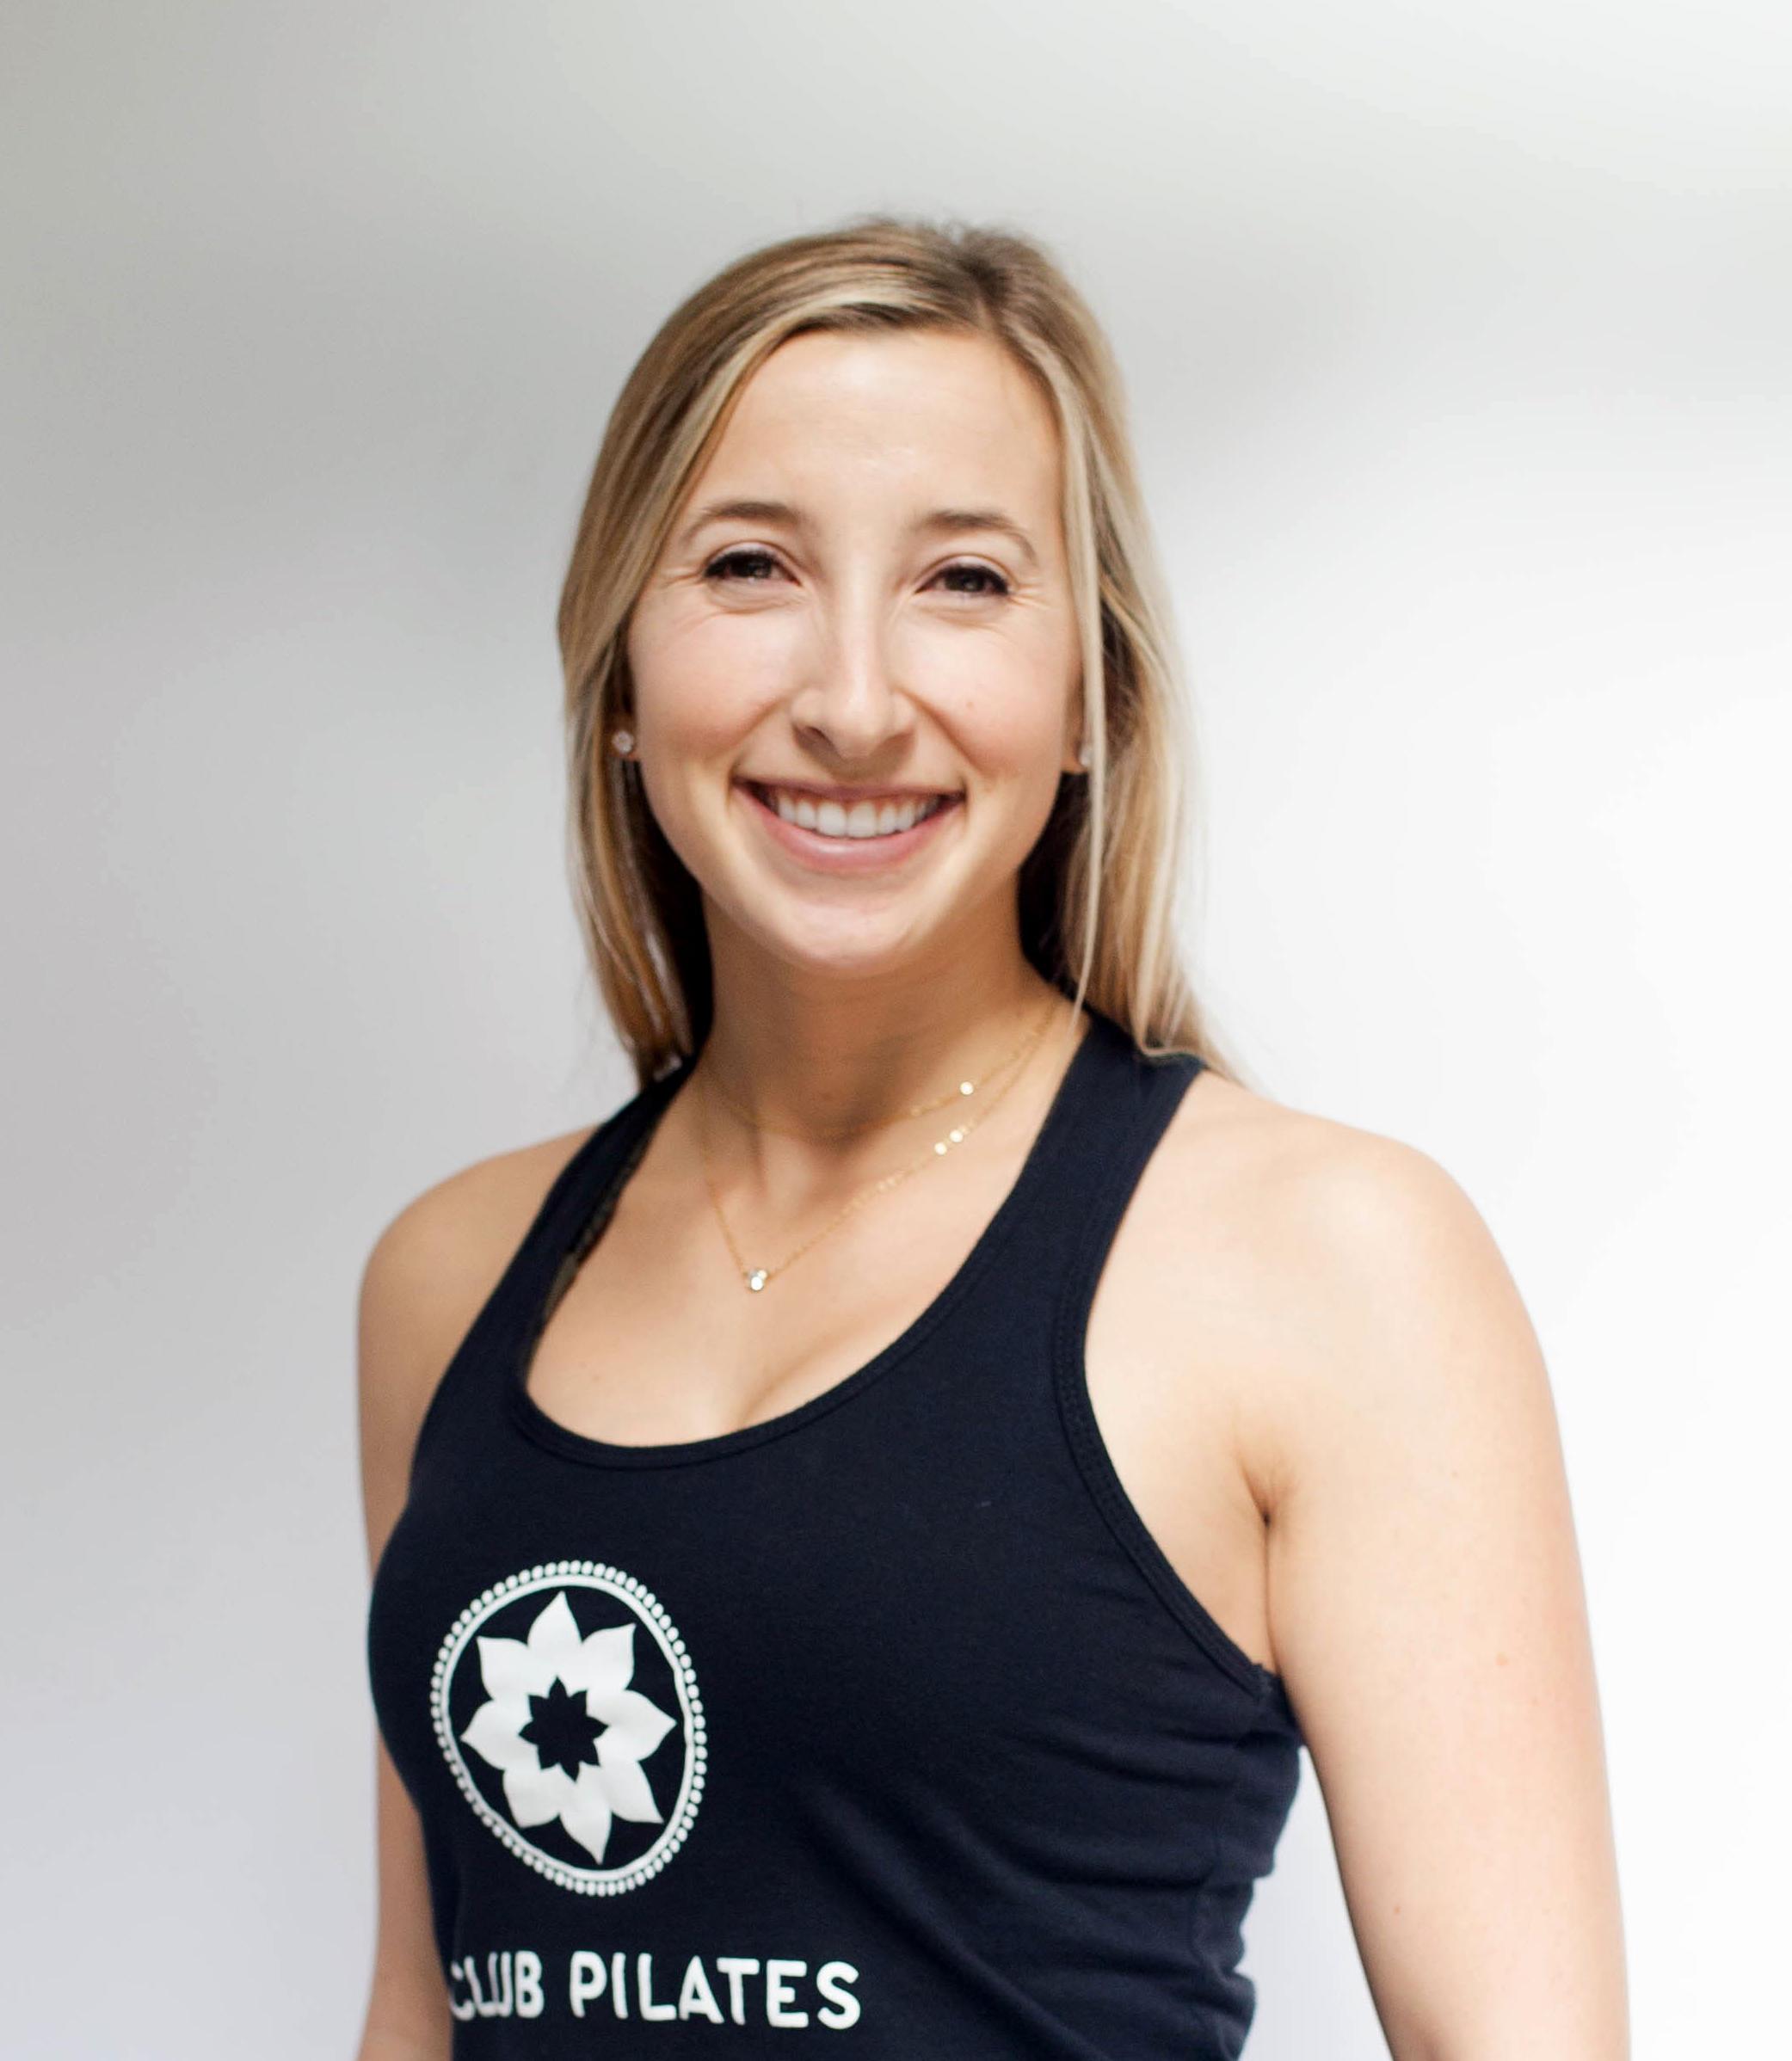 Jenna Thormodsgaard